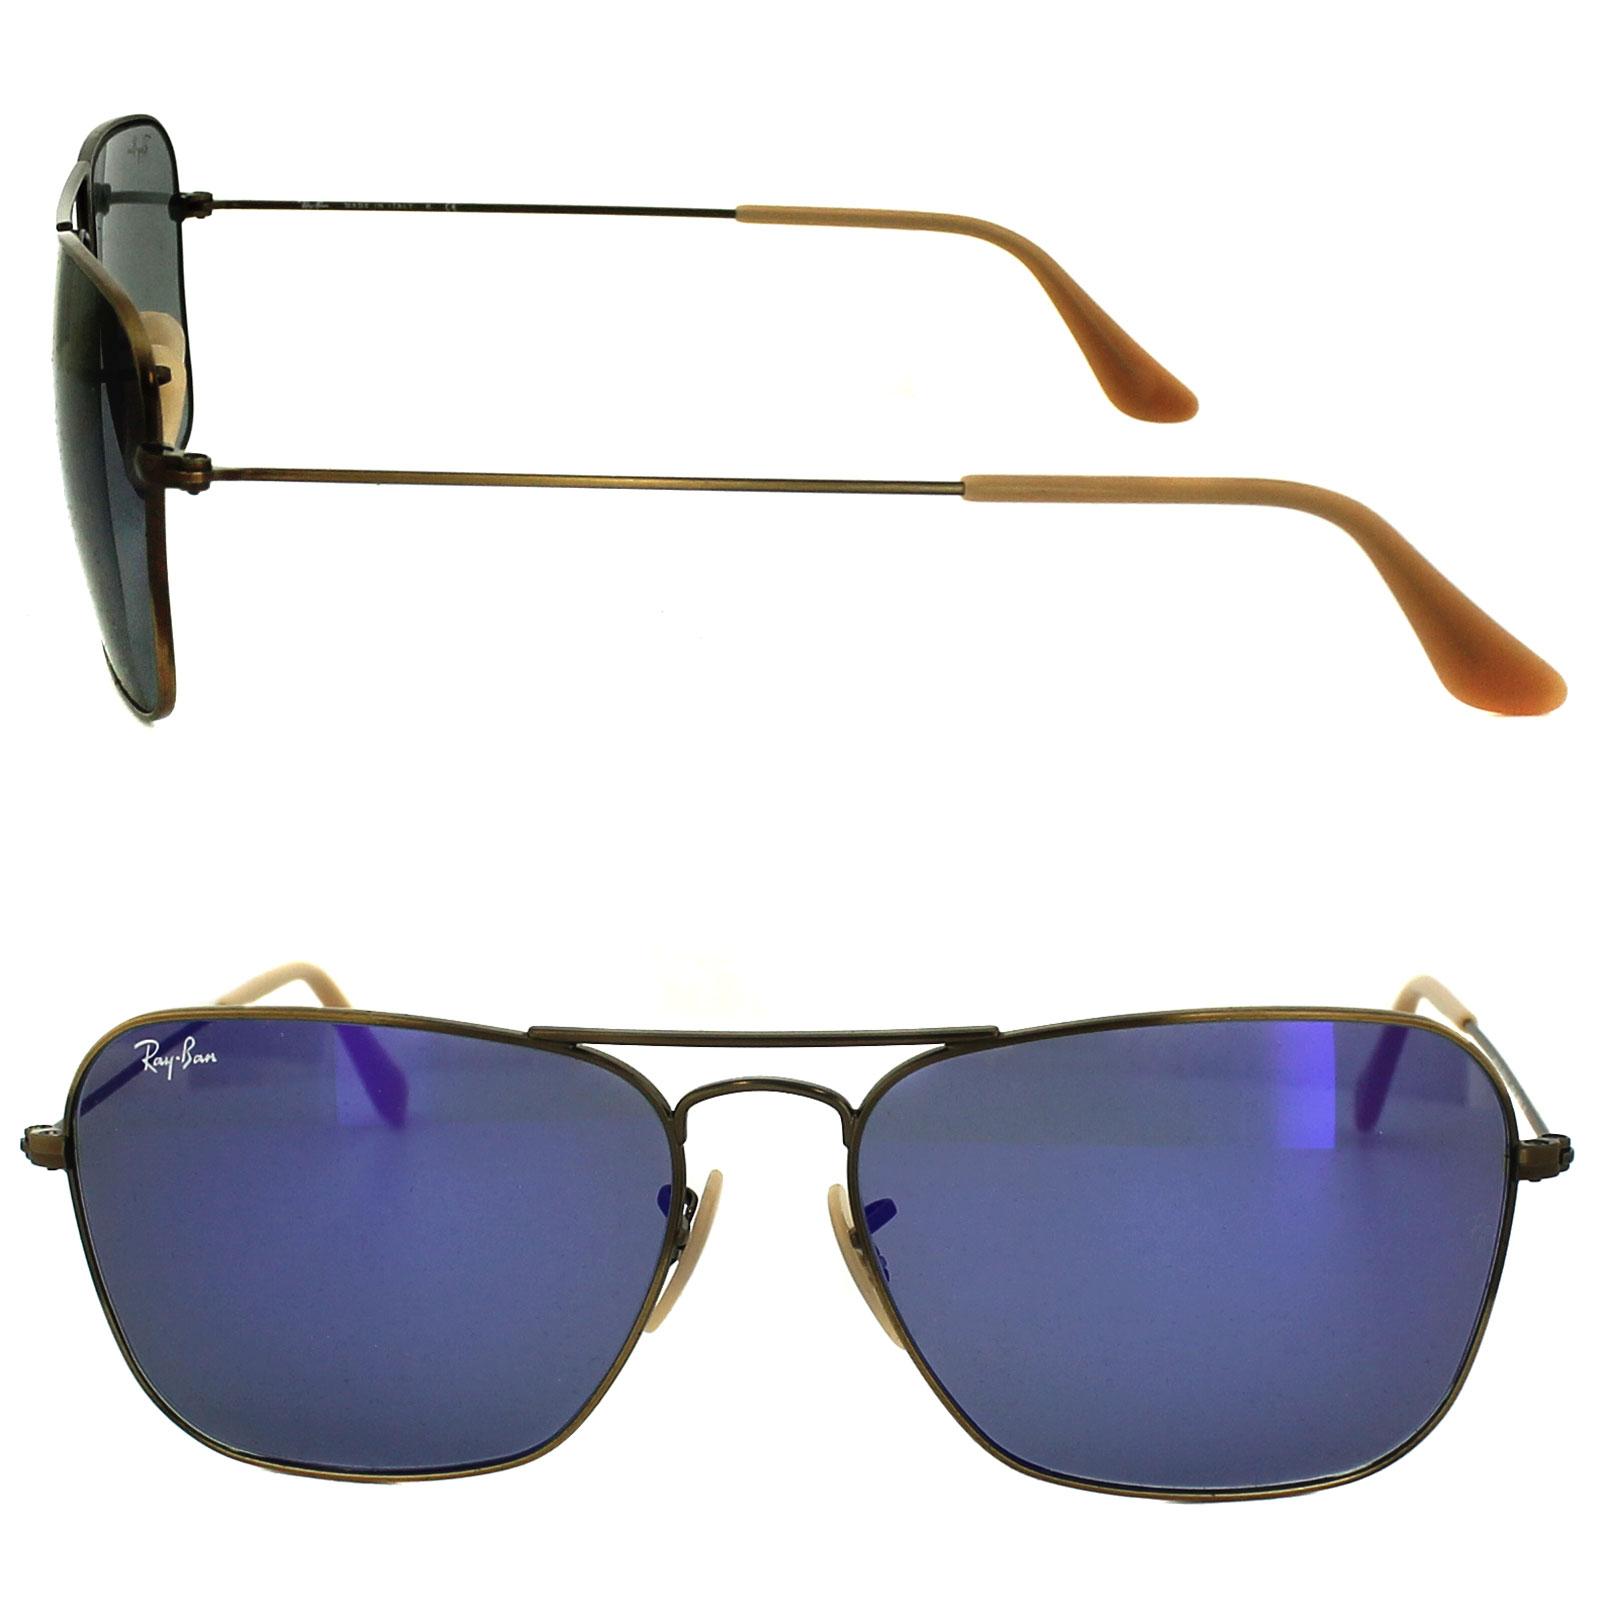 ray ban 3136 85ts  Sentinel Ray-Ban Sunglasses Caravan 3136 167/68 Brushed Bronze Blue Violet  Flash Mirror